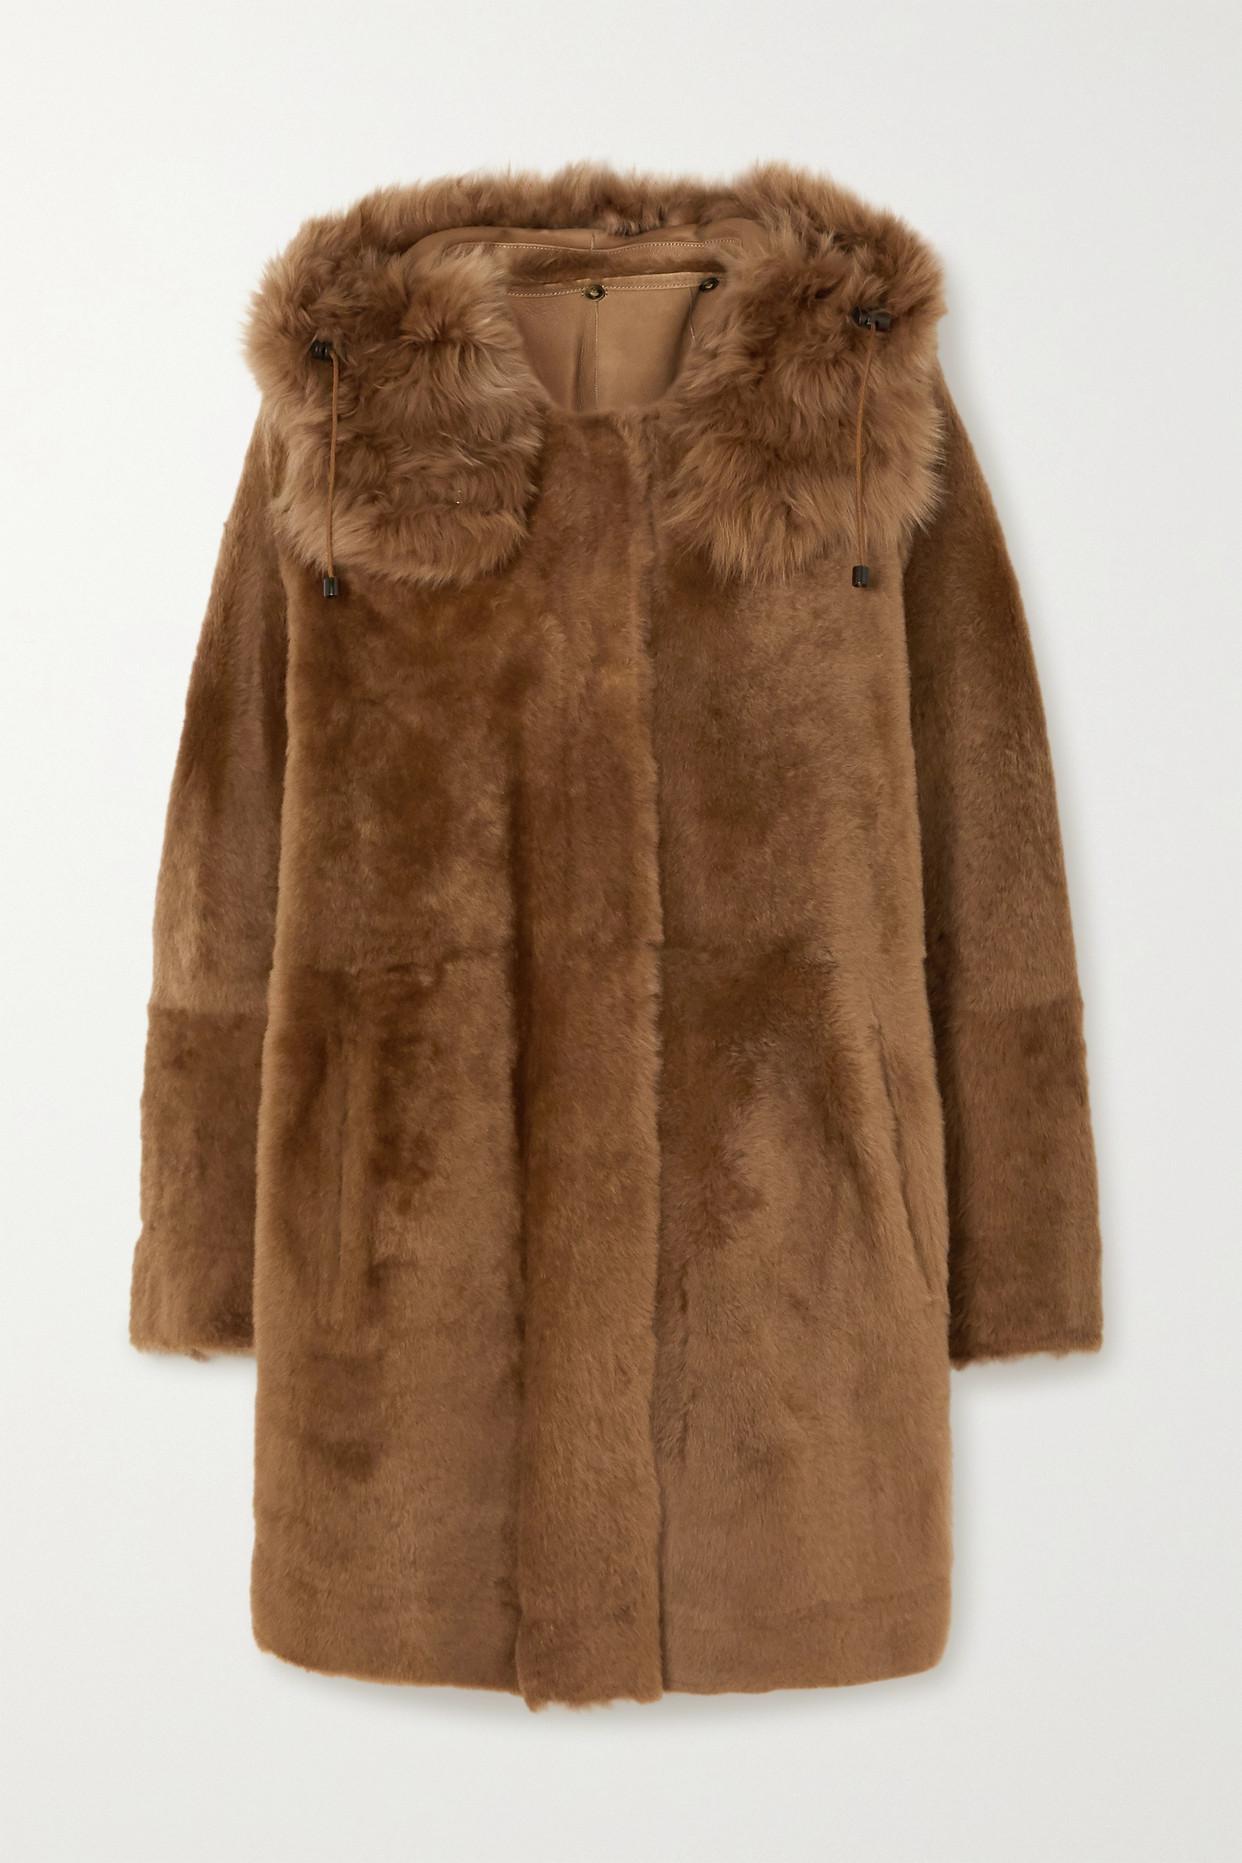 YVES SALOMON - 正反两穿连帽羊毛皮外套 - 棕色 - FR32